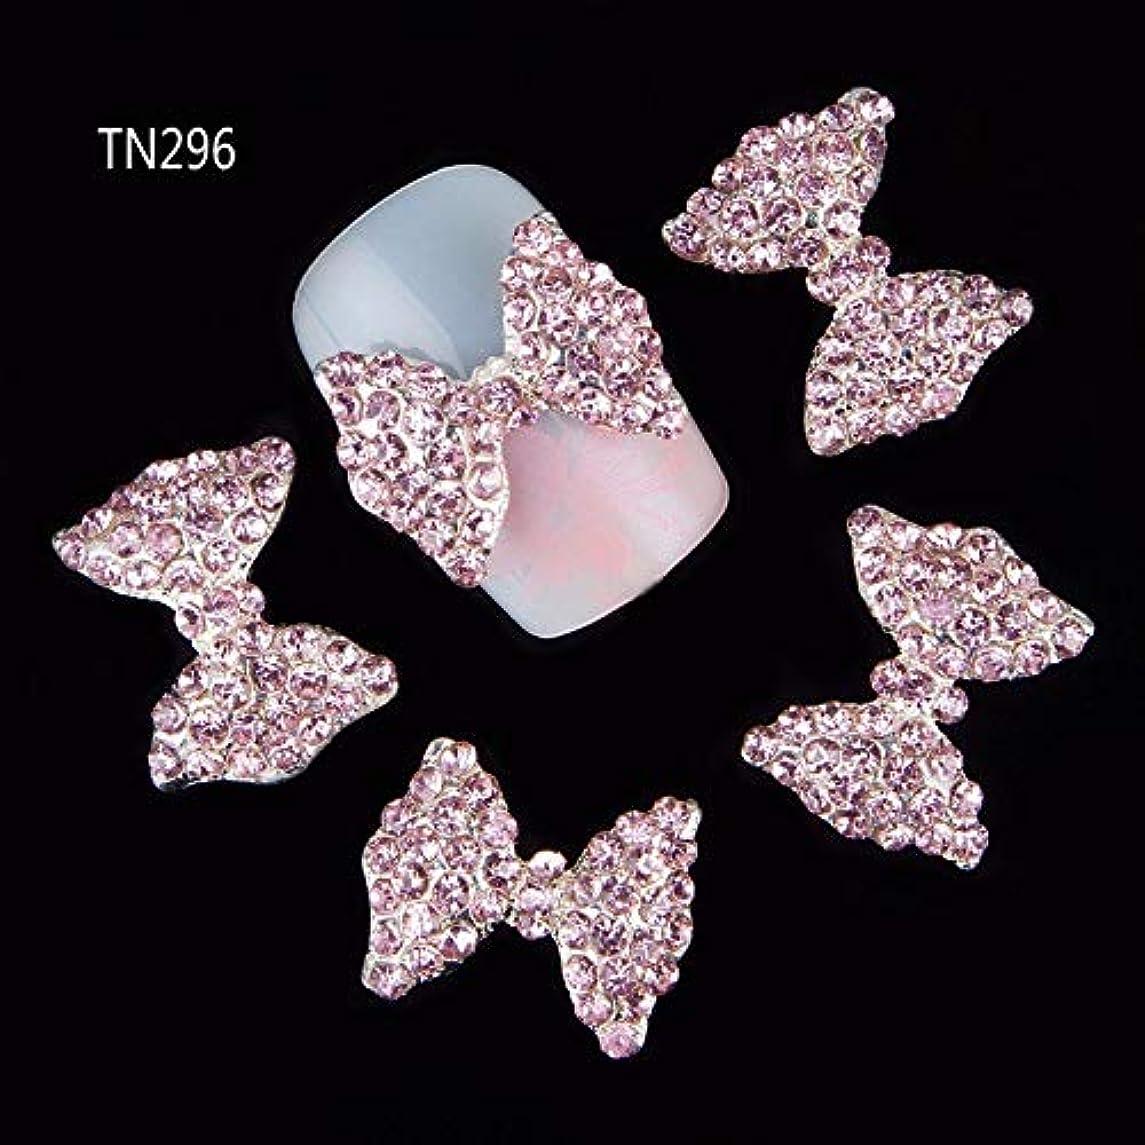 Kamas 10Pcs 3D Nail Art Tools Decorations Nail UV Gel Glitter Rhinestones Bow Design For Nails DIY Charms Alloy Jewelry TN296